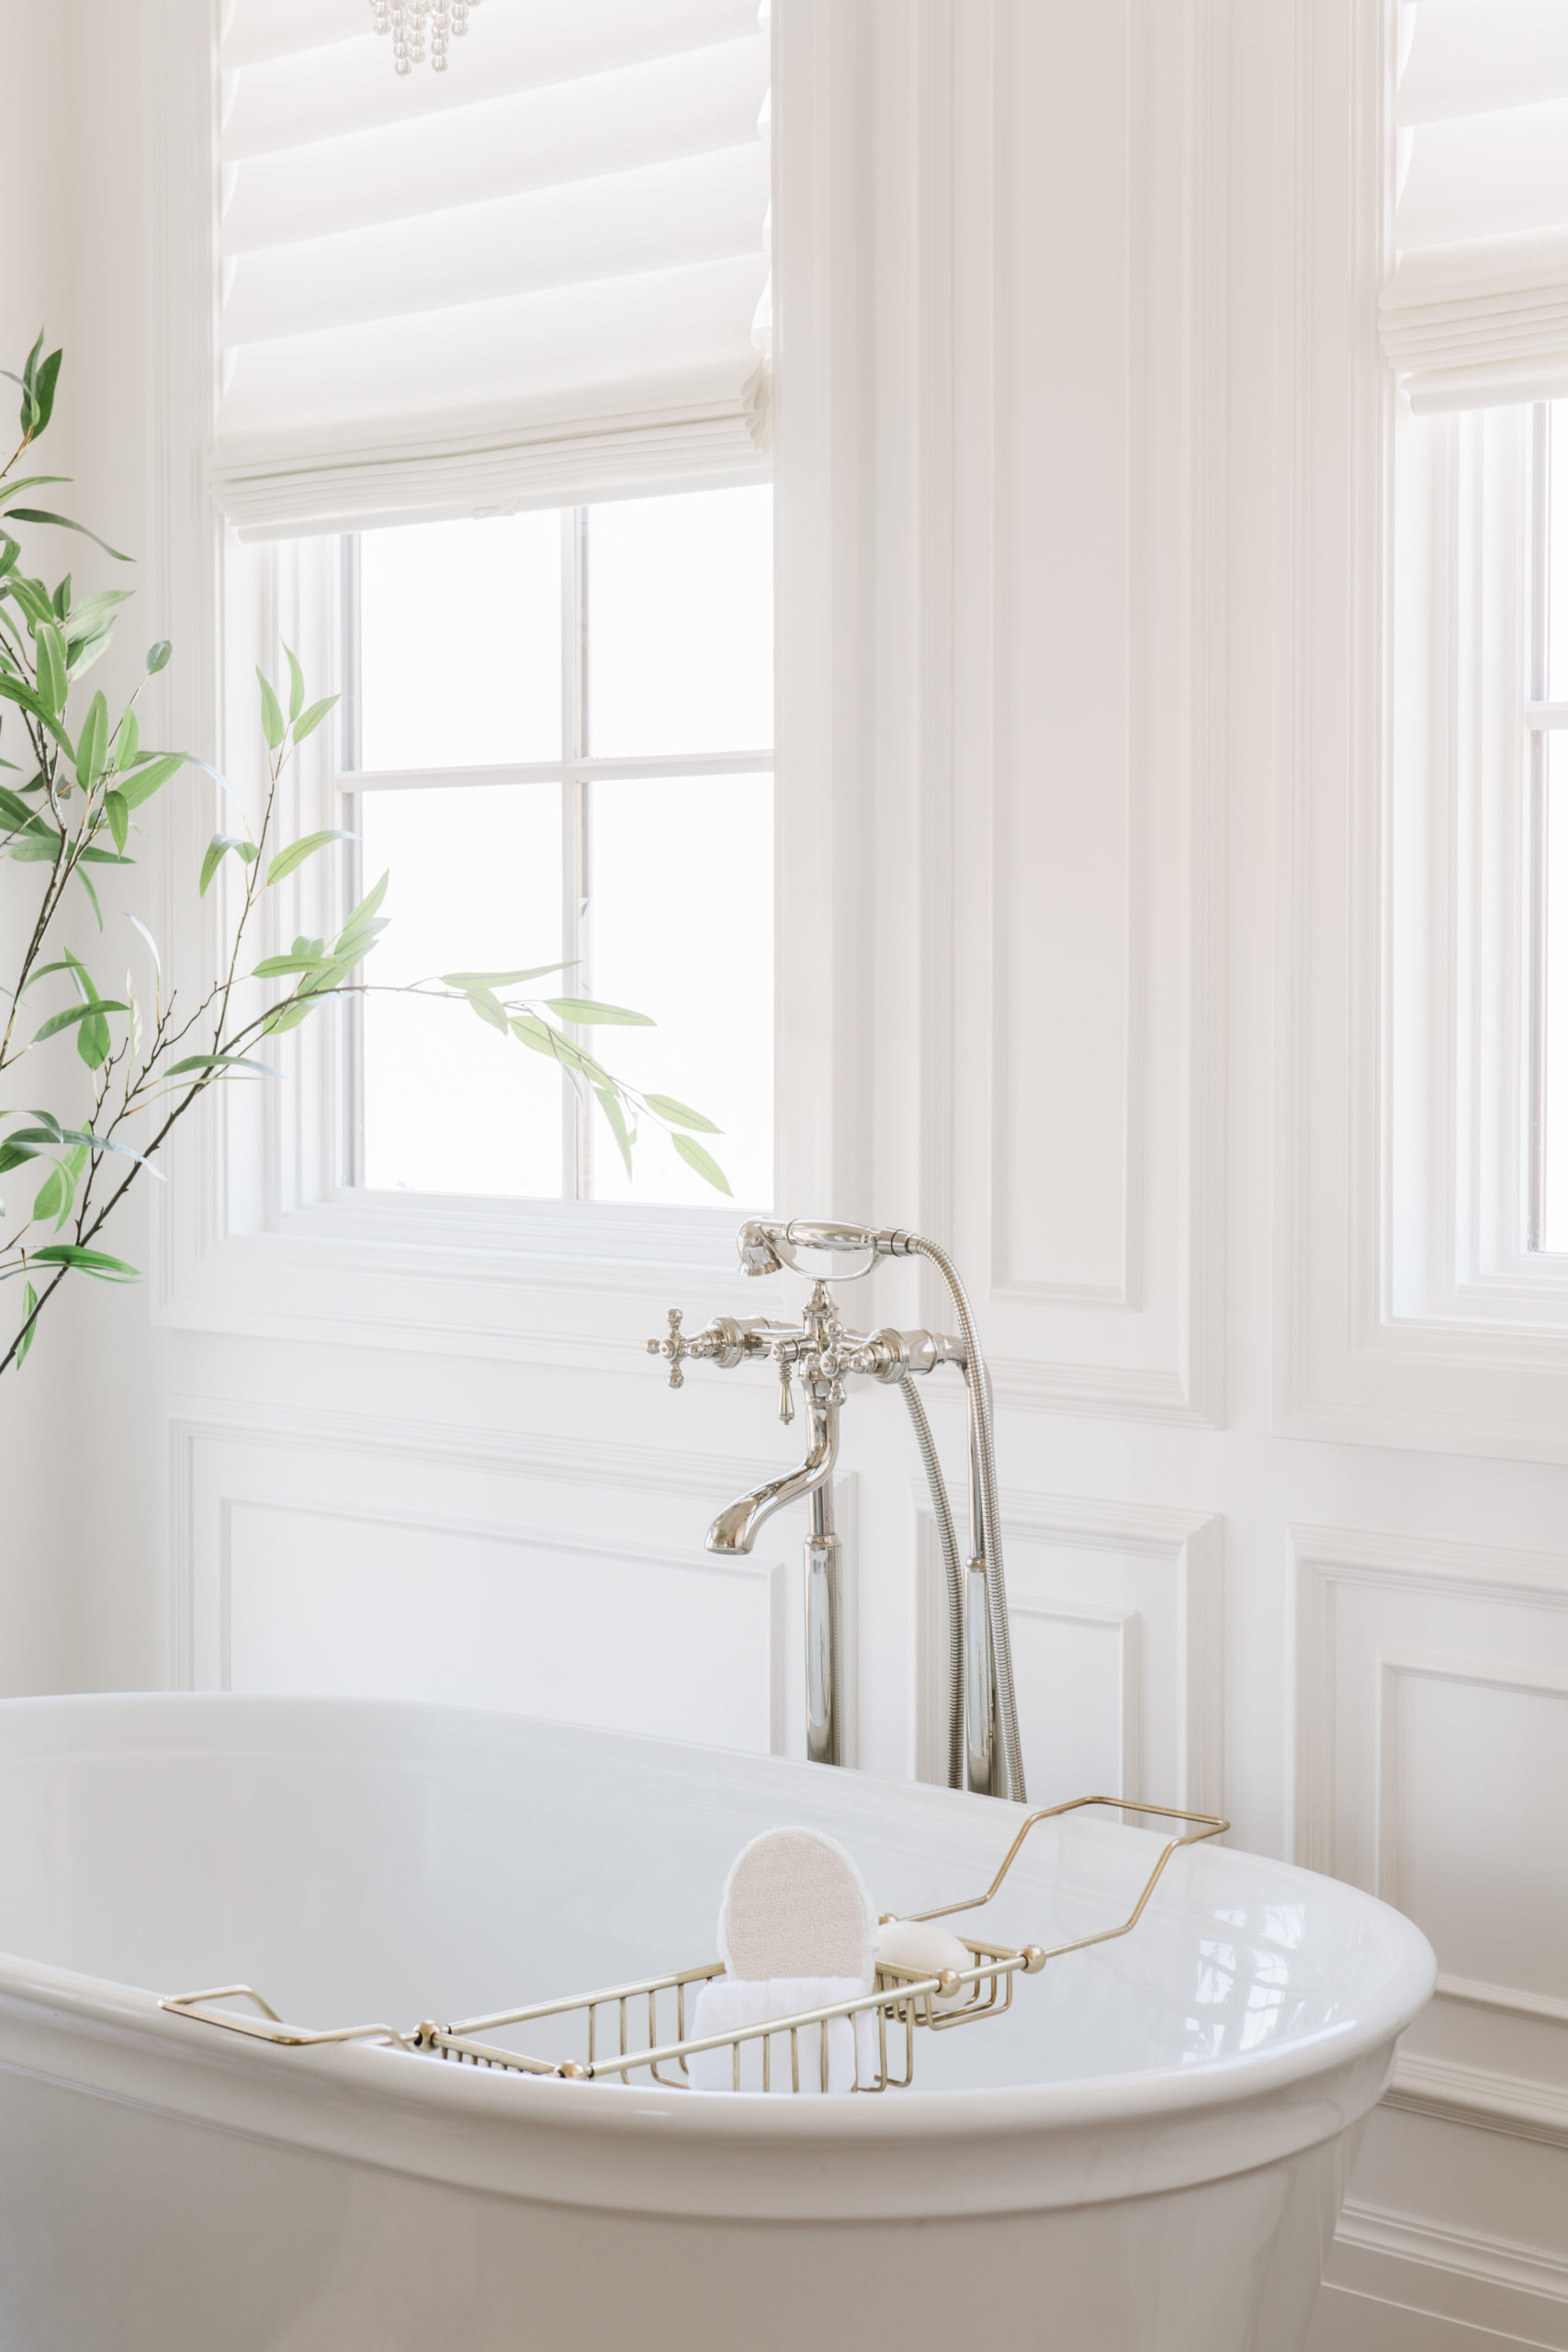 Christine Andrew master bathroom large tub